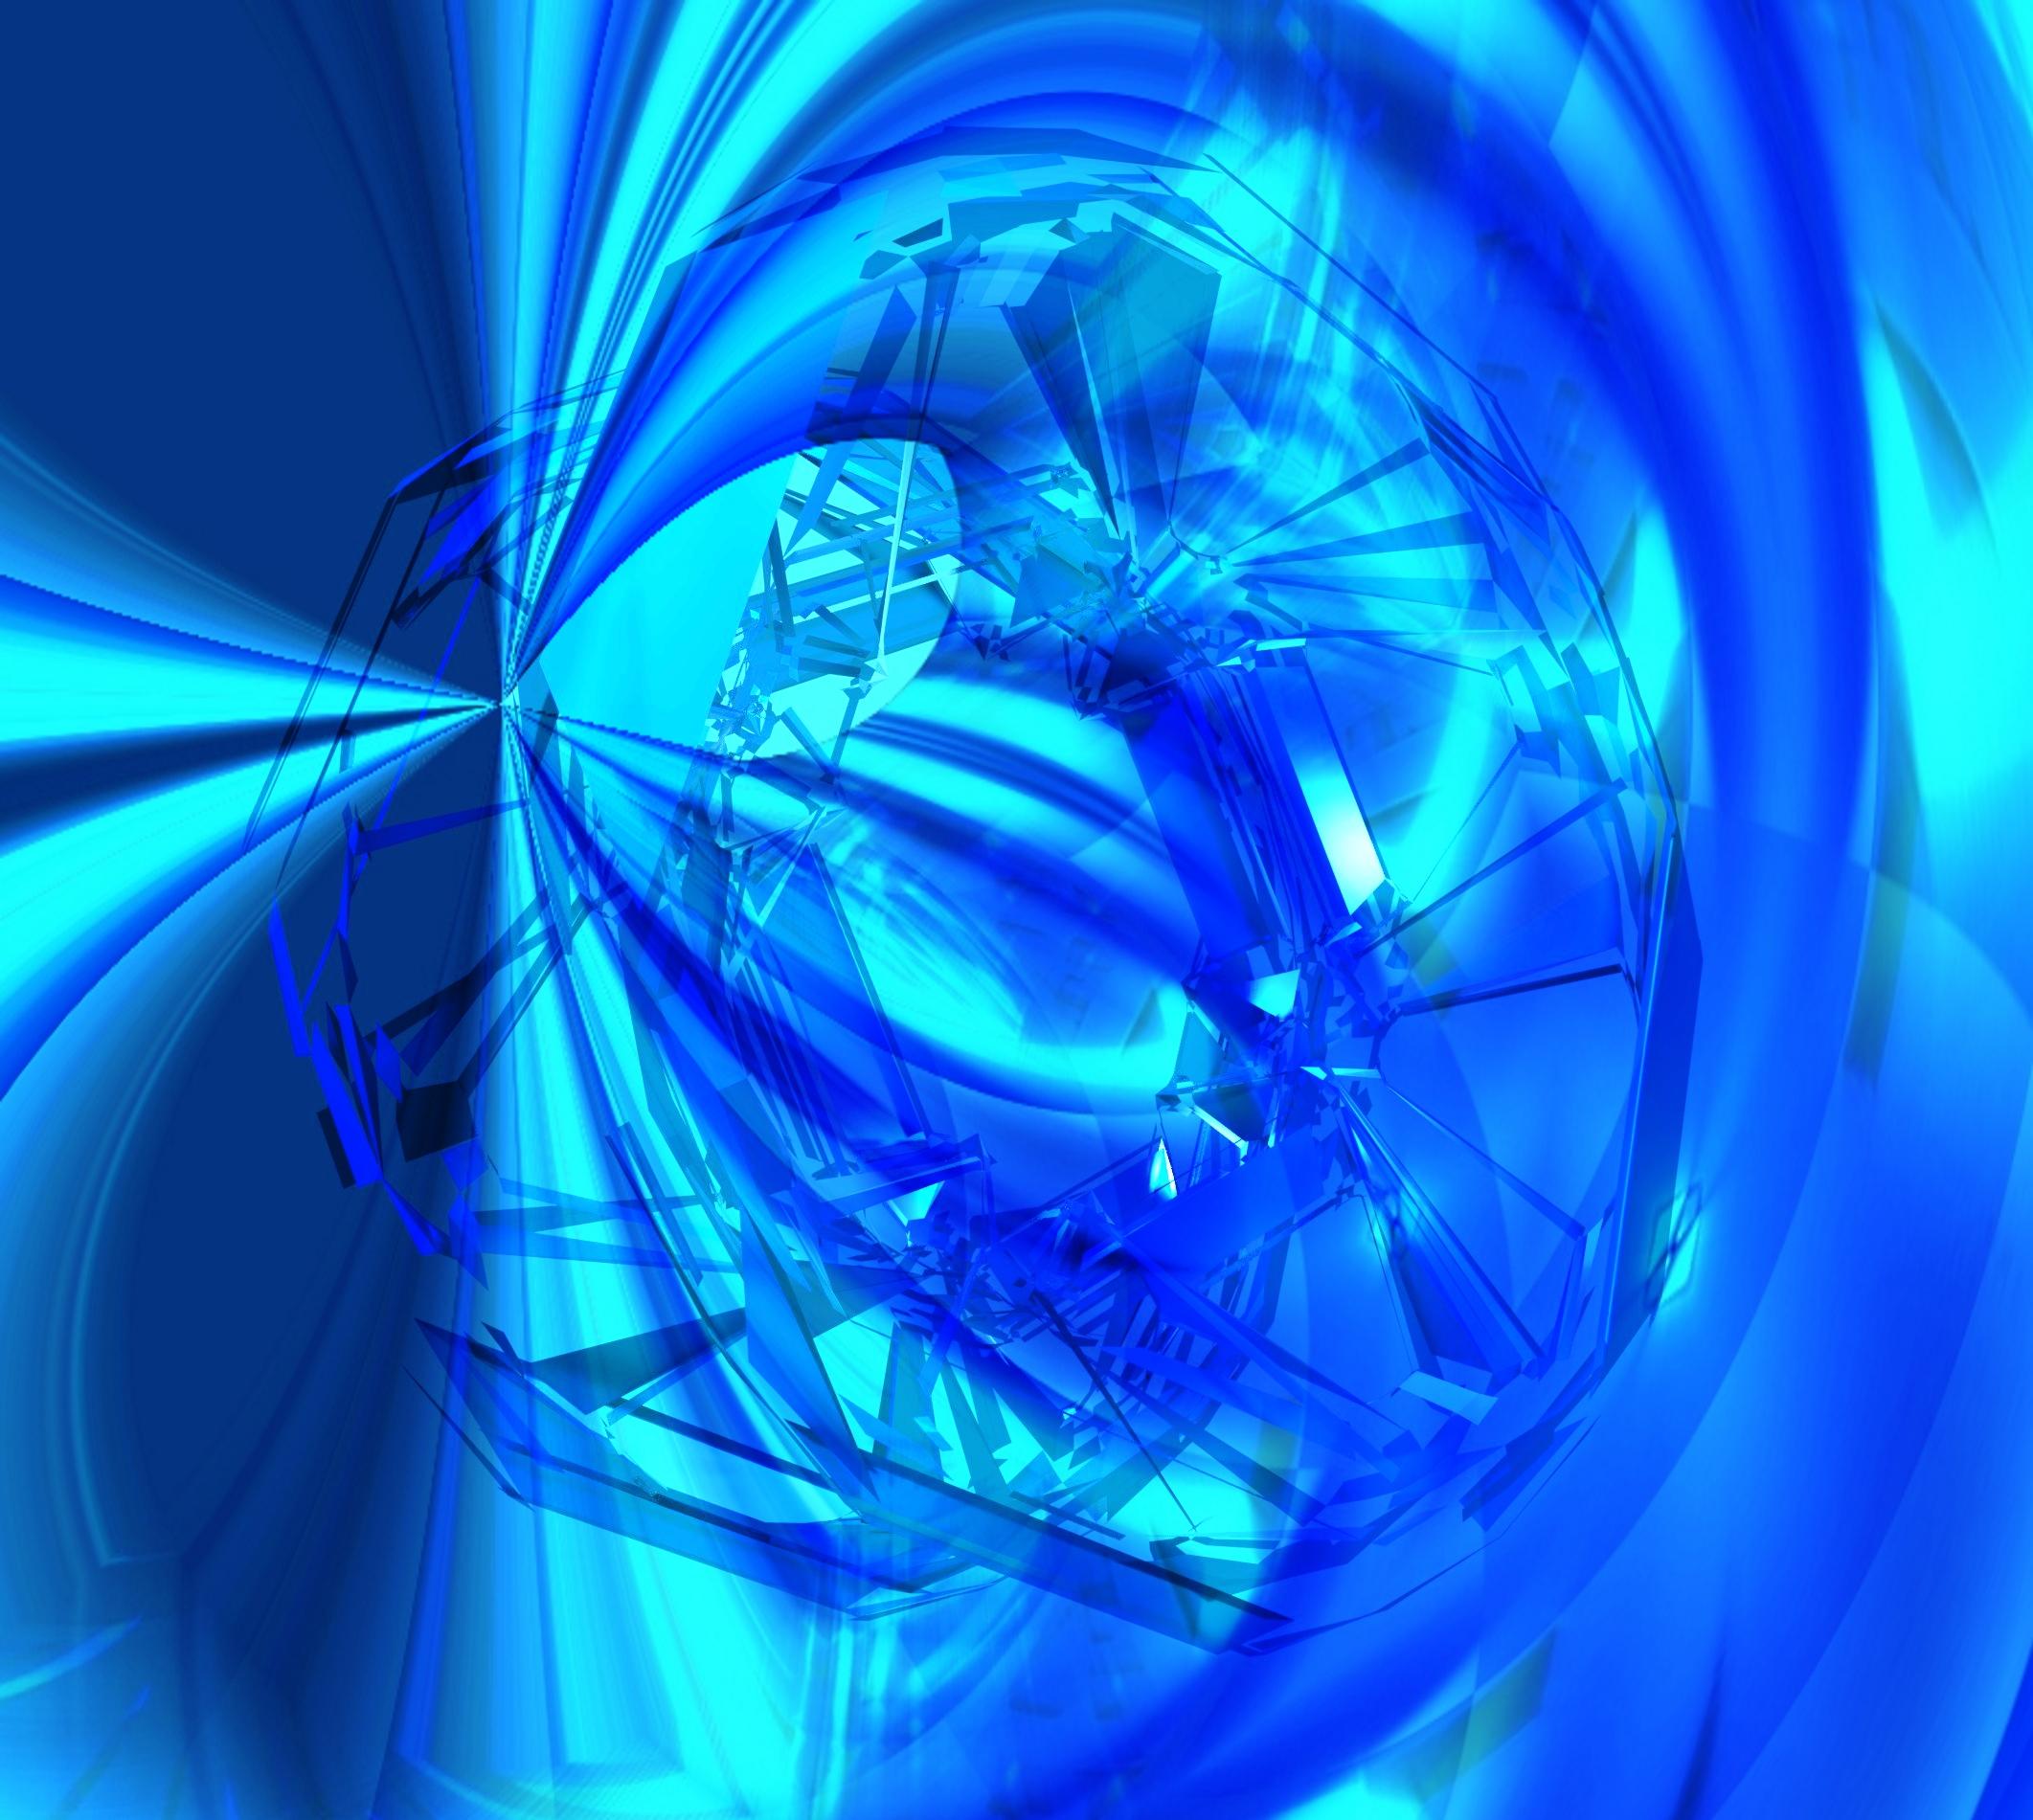 Cgi Digital Art 2123x1901